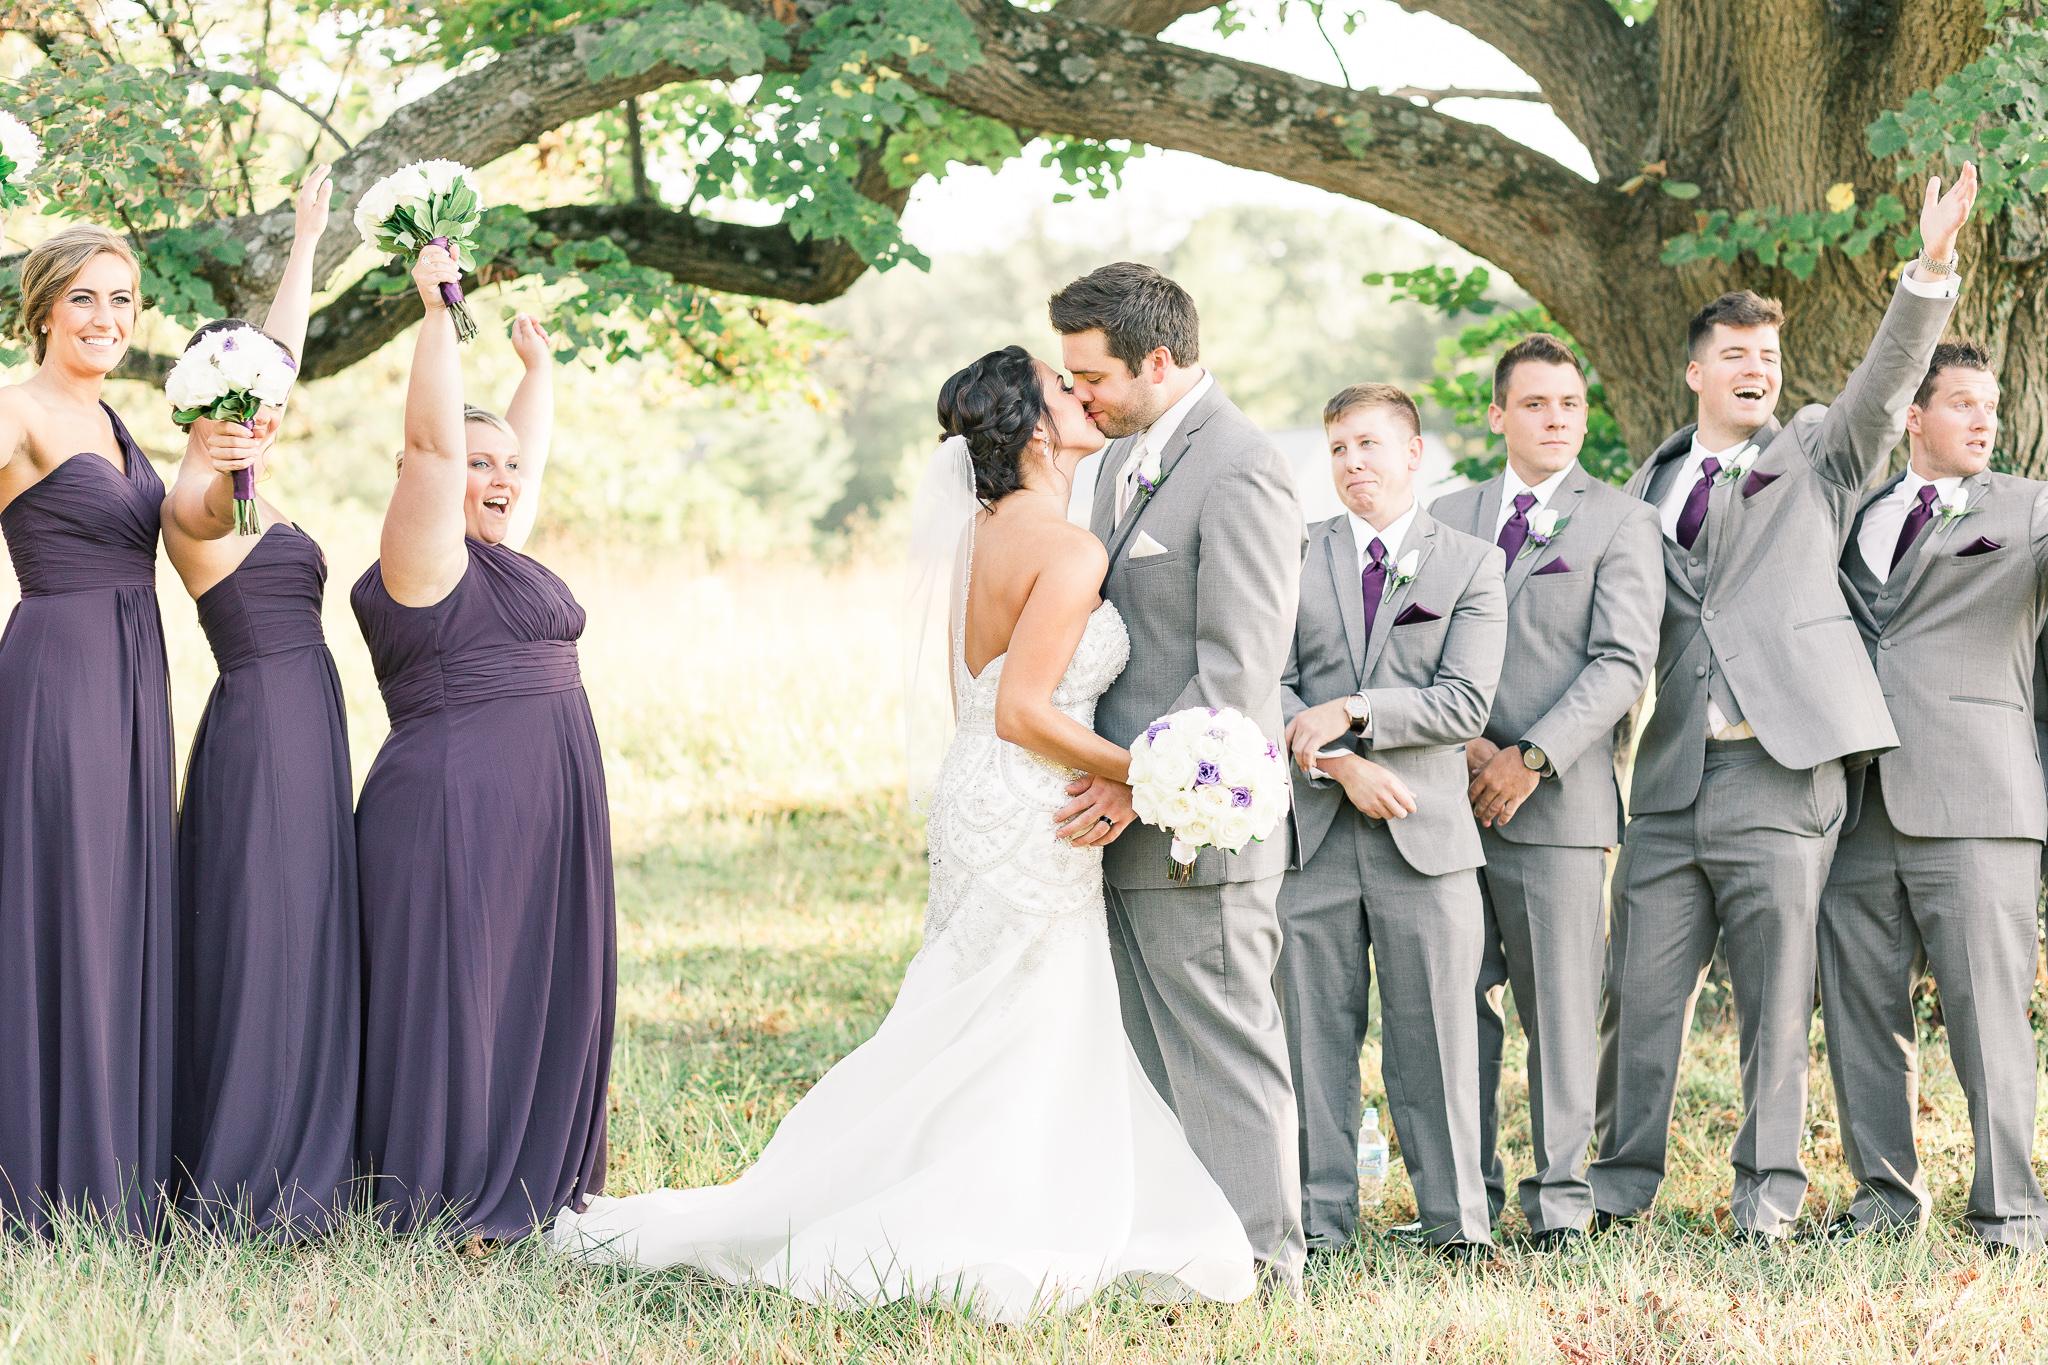 purple-wedding-party-baltimore-photographer